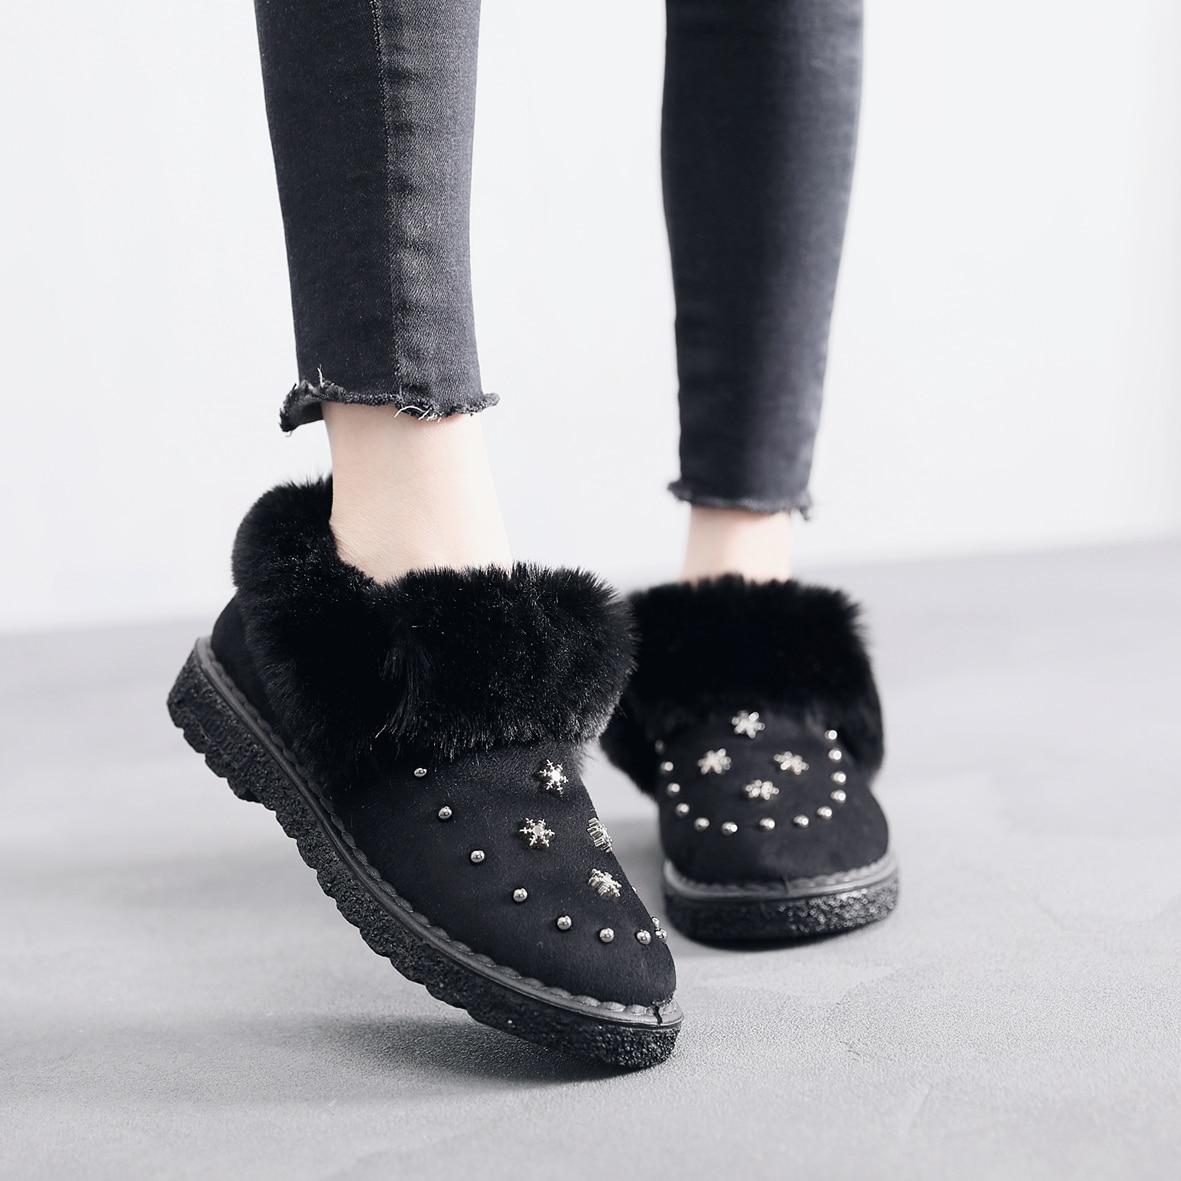 Ankle Boots Women Flats Winter Warm Snow Suede Short New  Shoes Fur Plush Black Brown